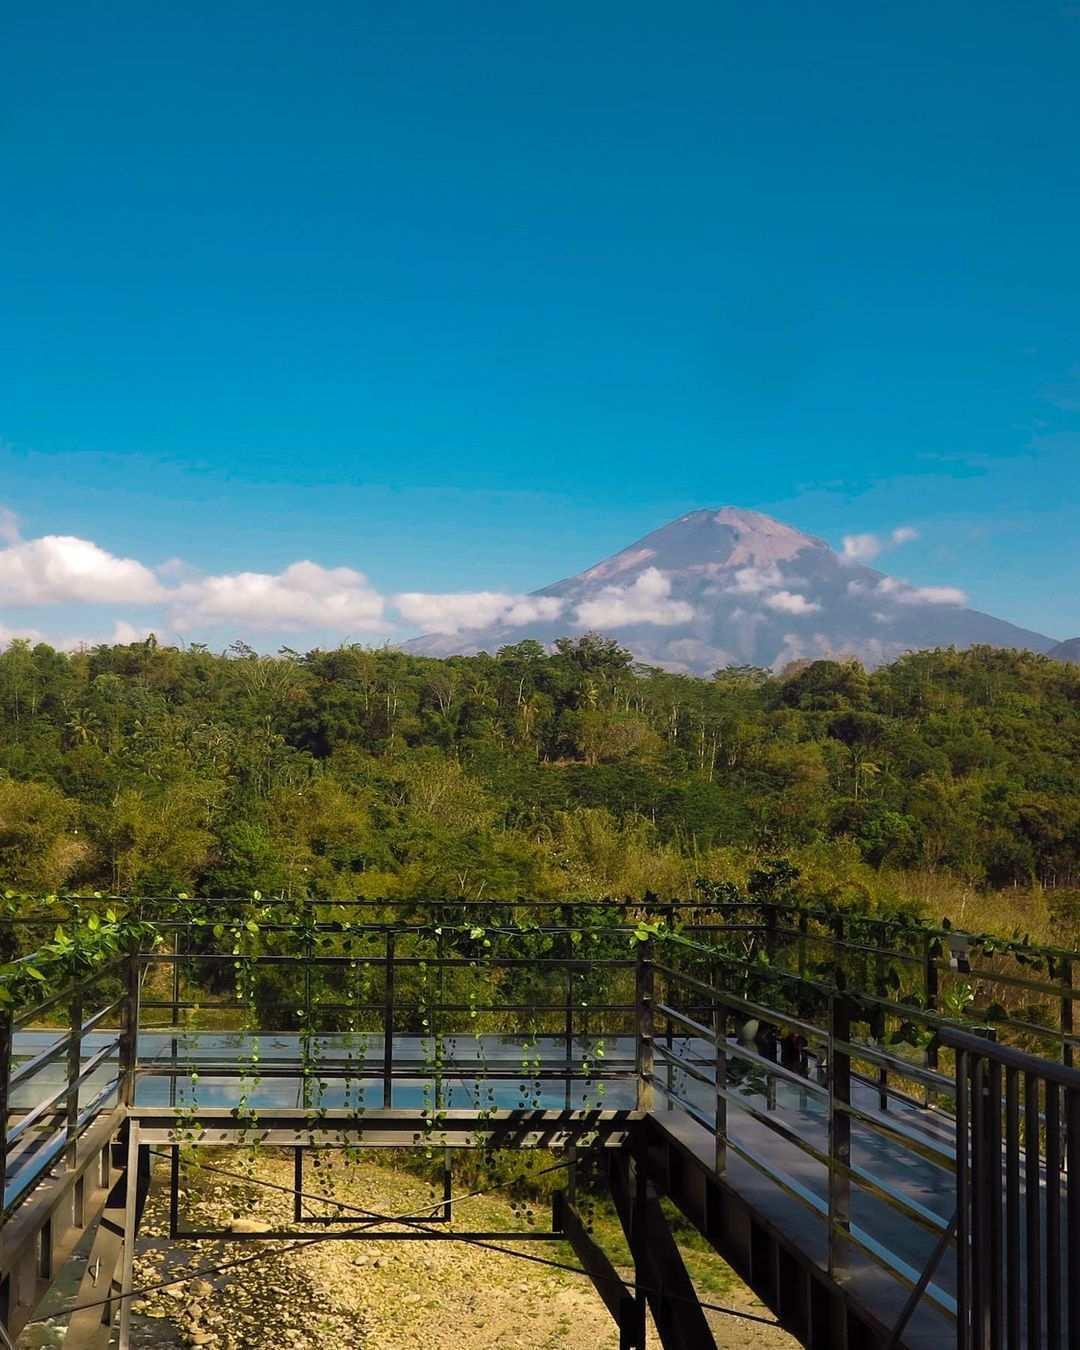 Pemandangan Gunung dari Taman Kyai Langgeng Magelang Image From @gabrielaliuw